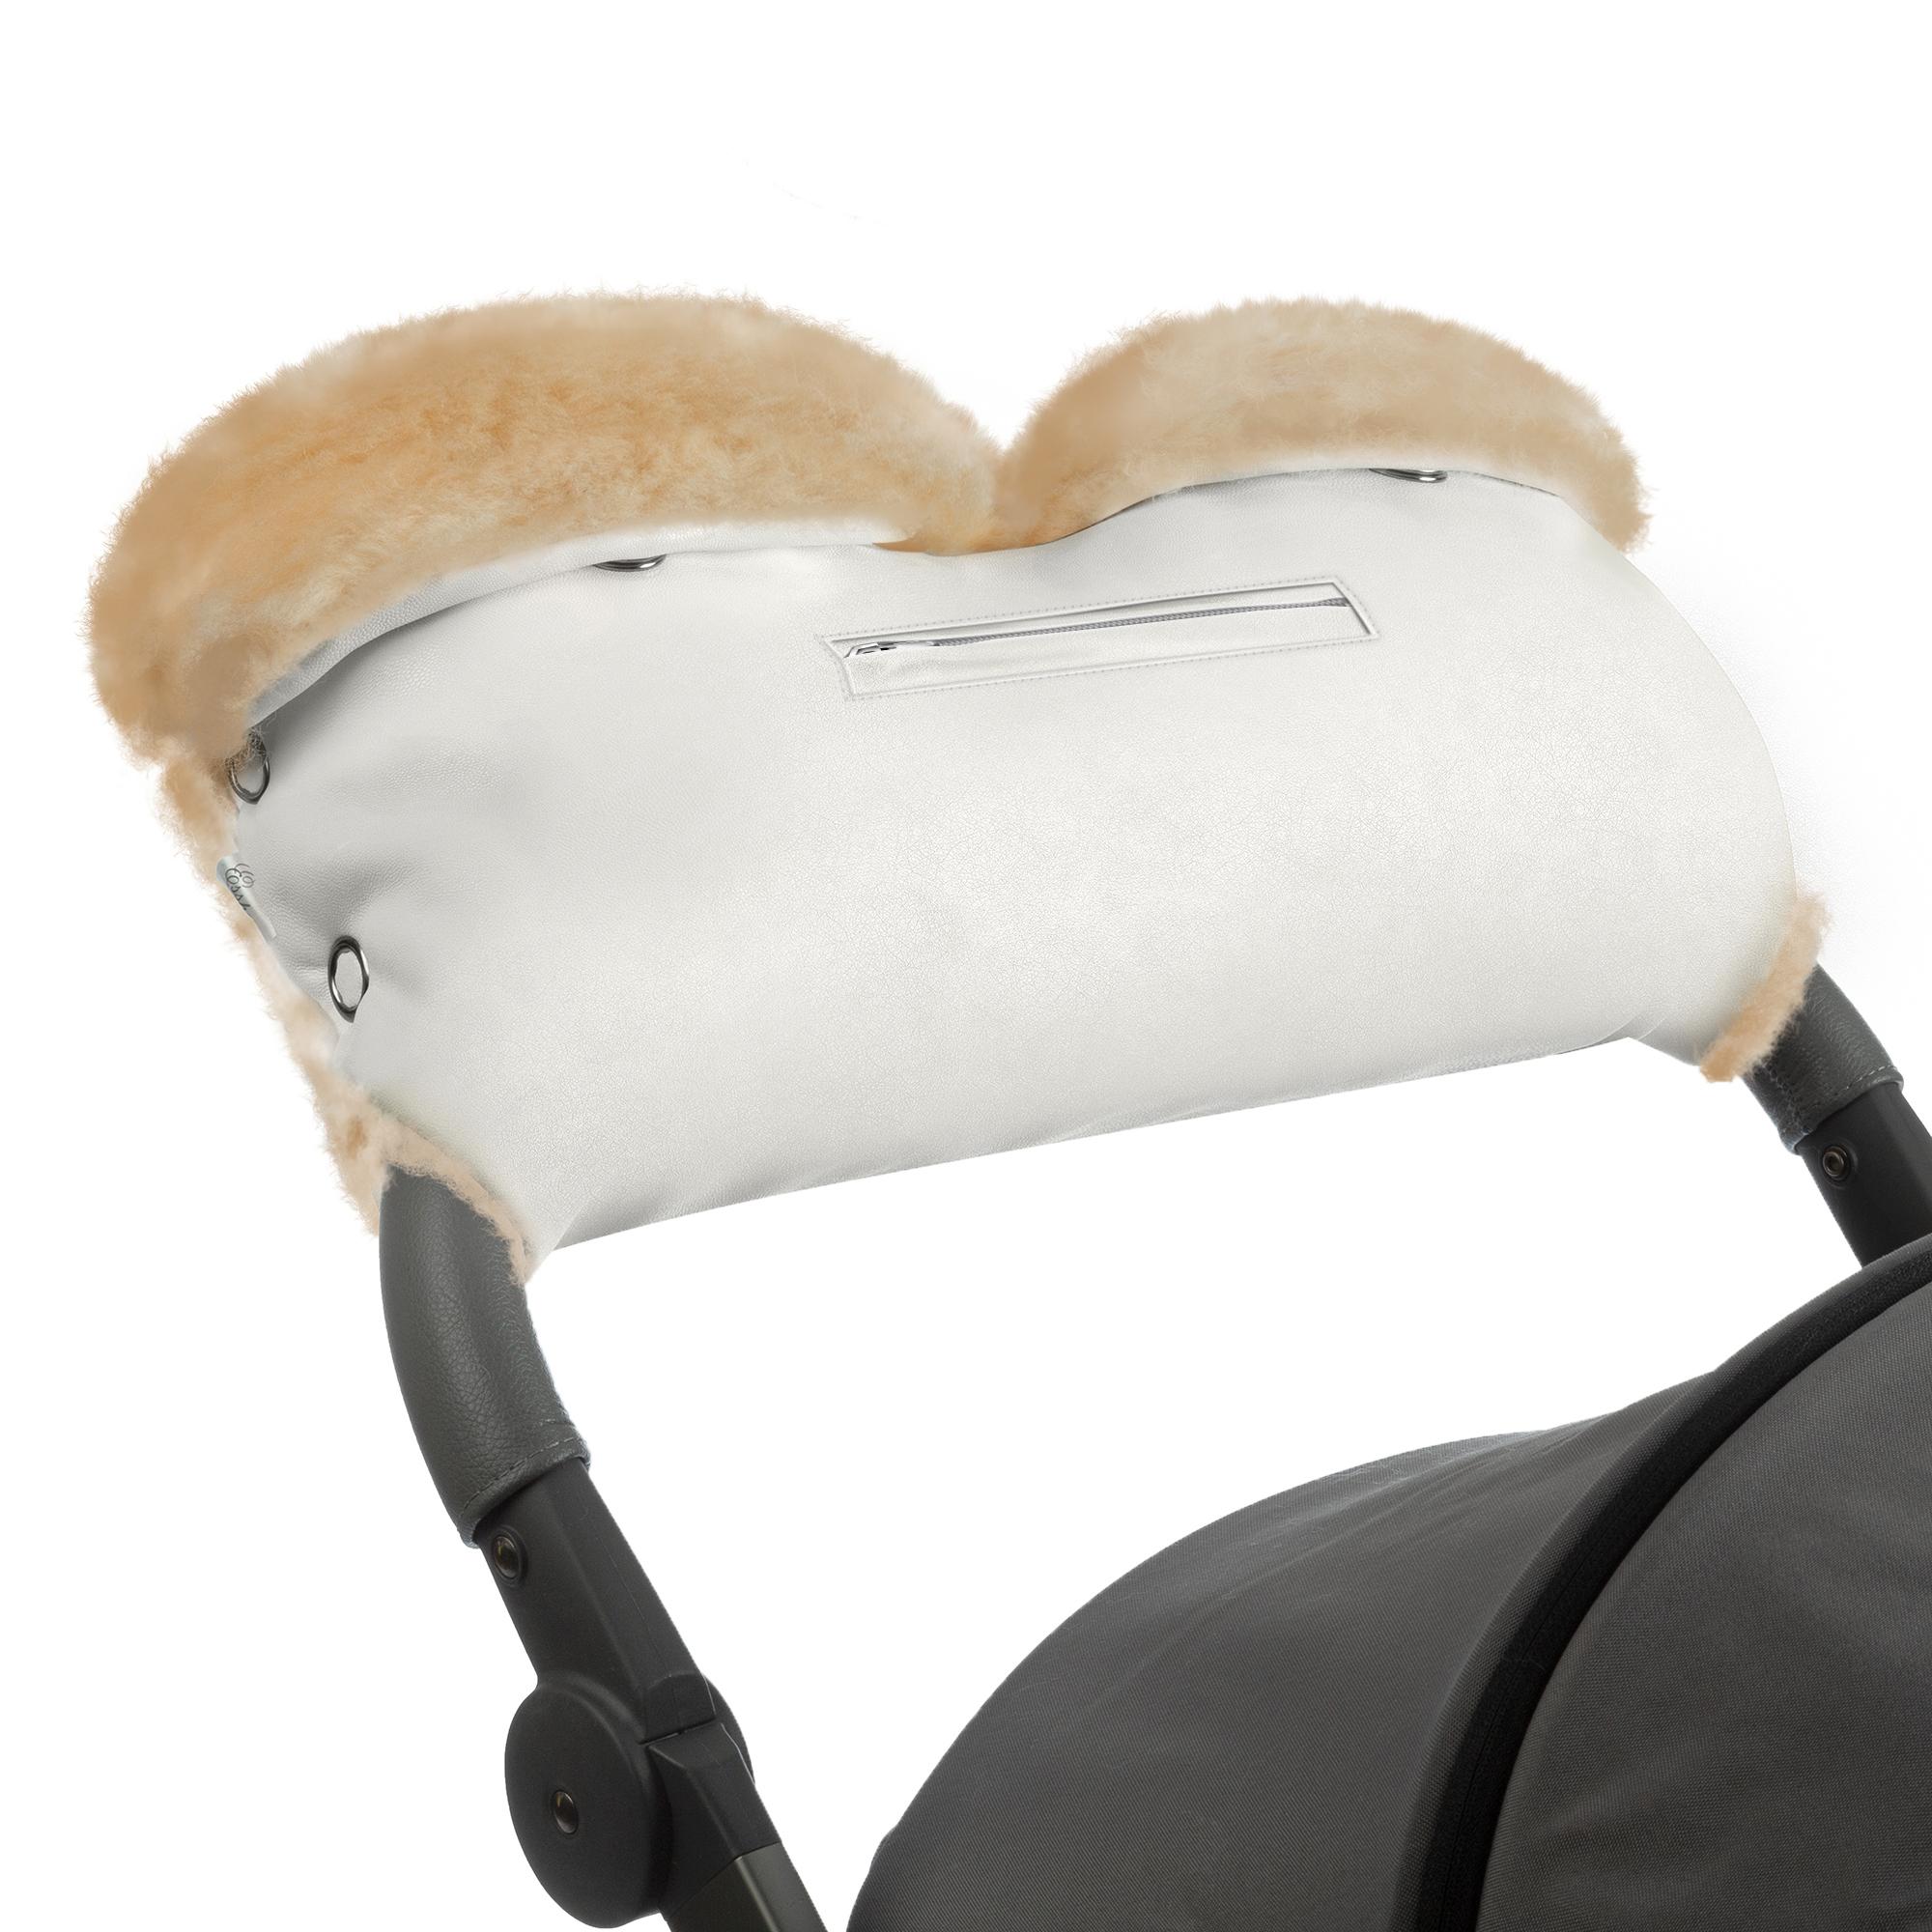 Купить Муфта для рук на коляску Esspero Isabella White 100% овечья шерсть, Муфты на коляску